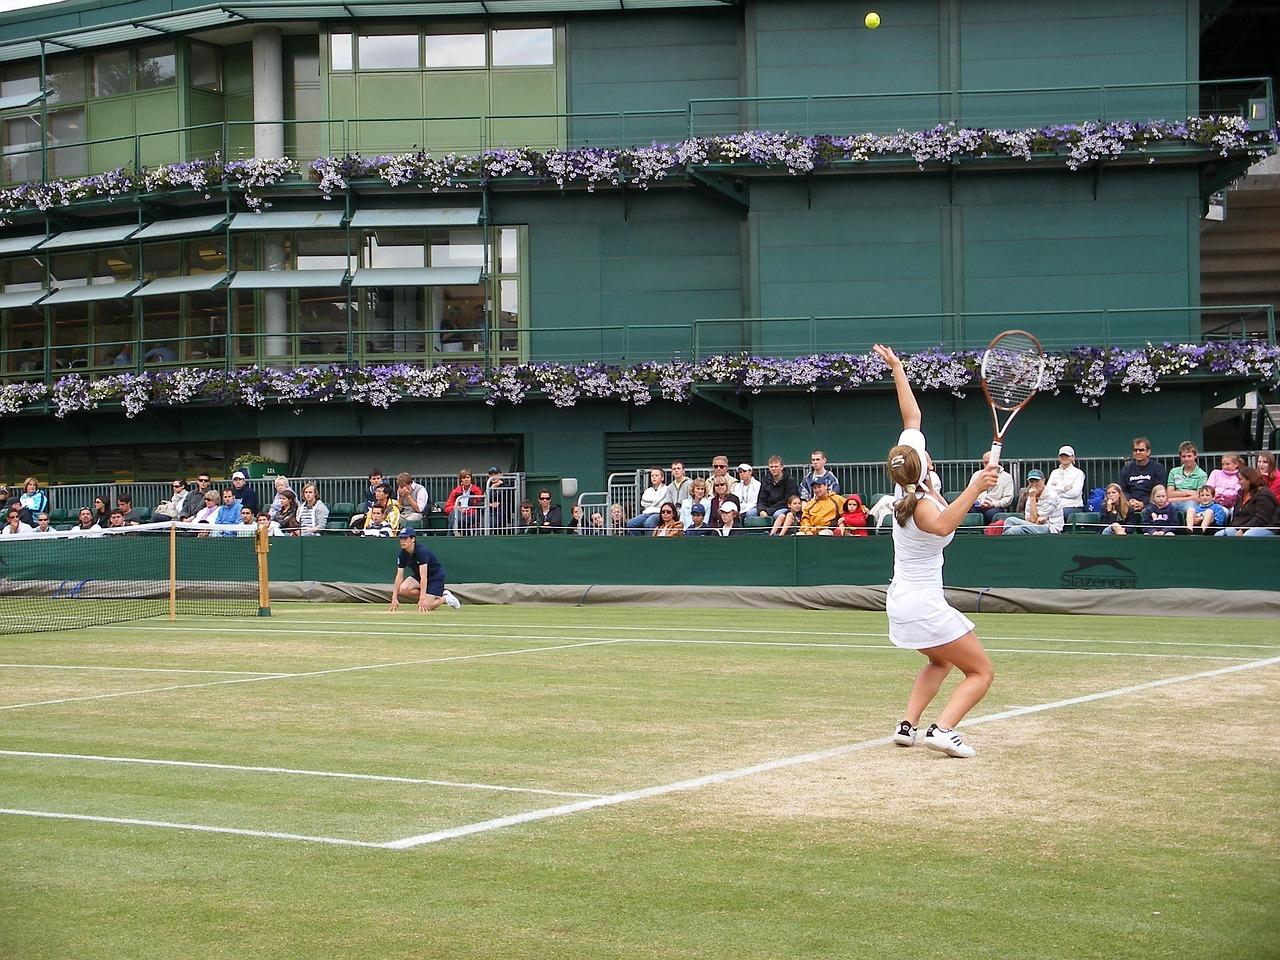 Vacation Rental in Wimbledon London UK